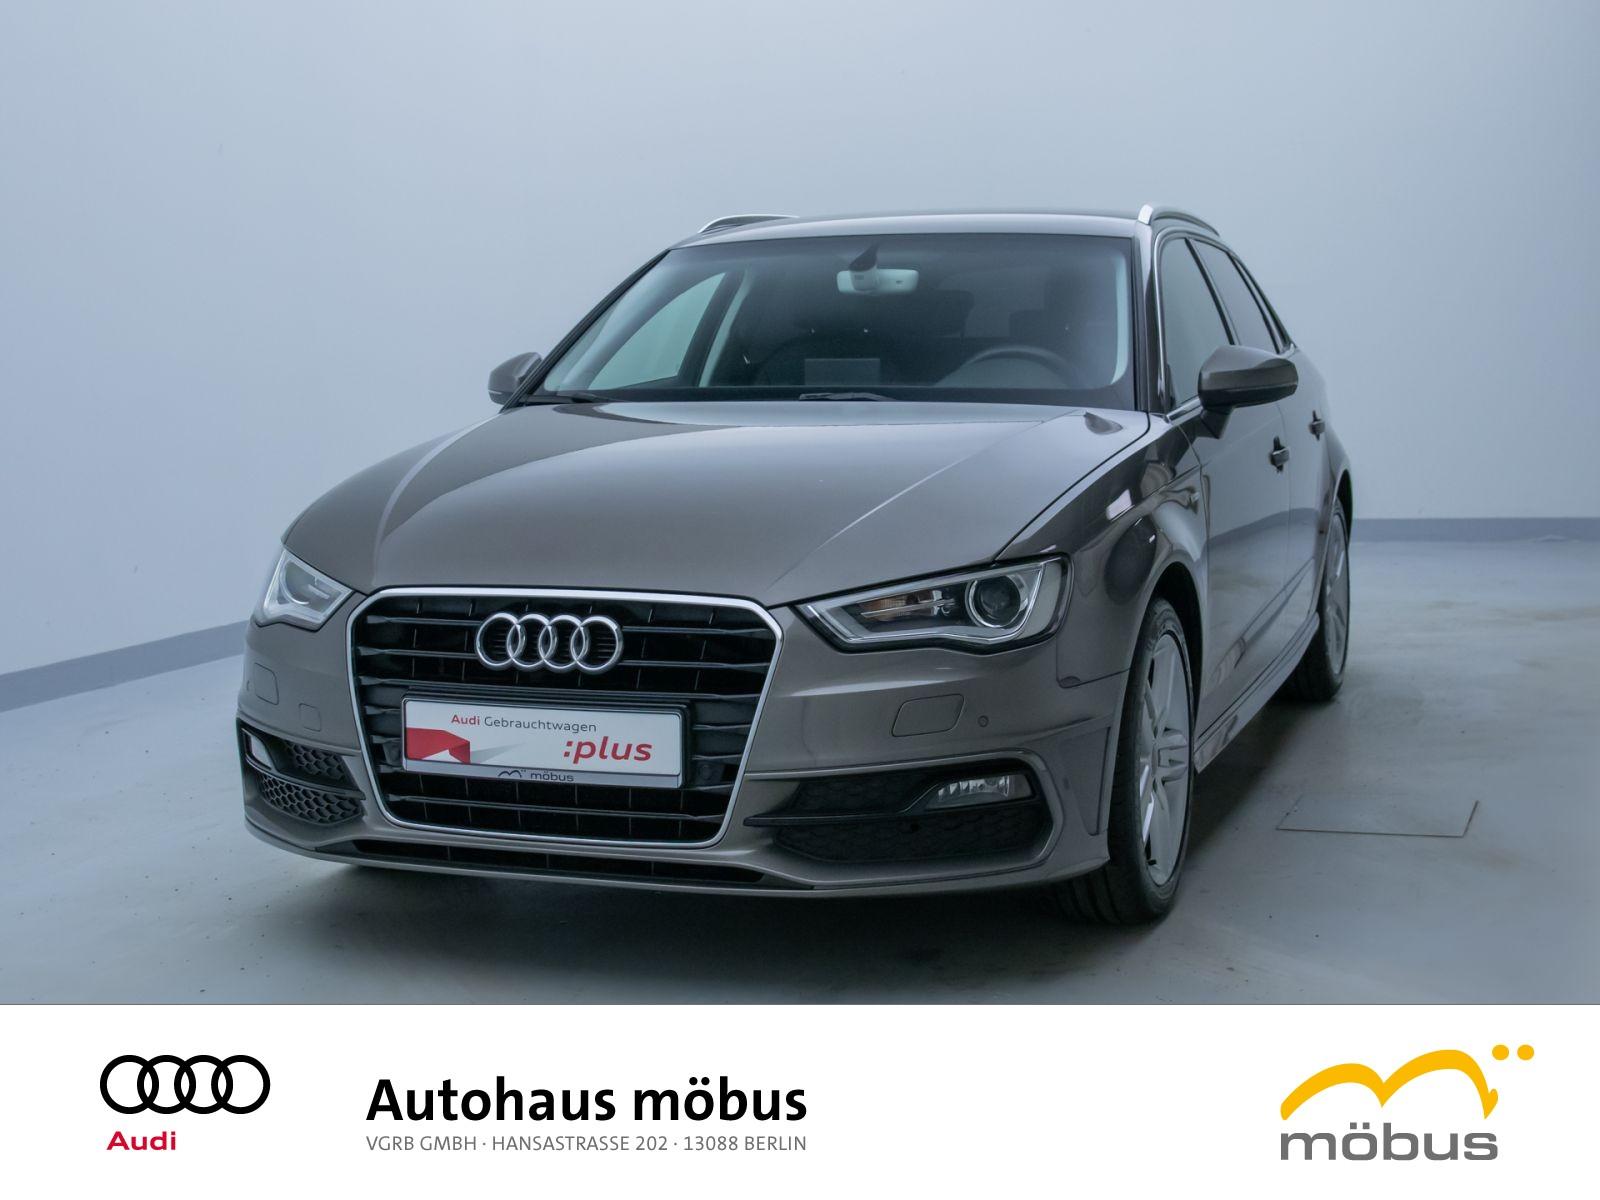 Audi A3 Sportback Attraction 1.4 TFSI S-TRO*SLINE*LED, Jahr 2015, Benzin